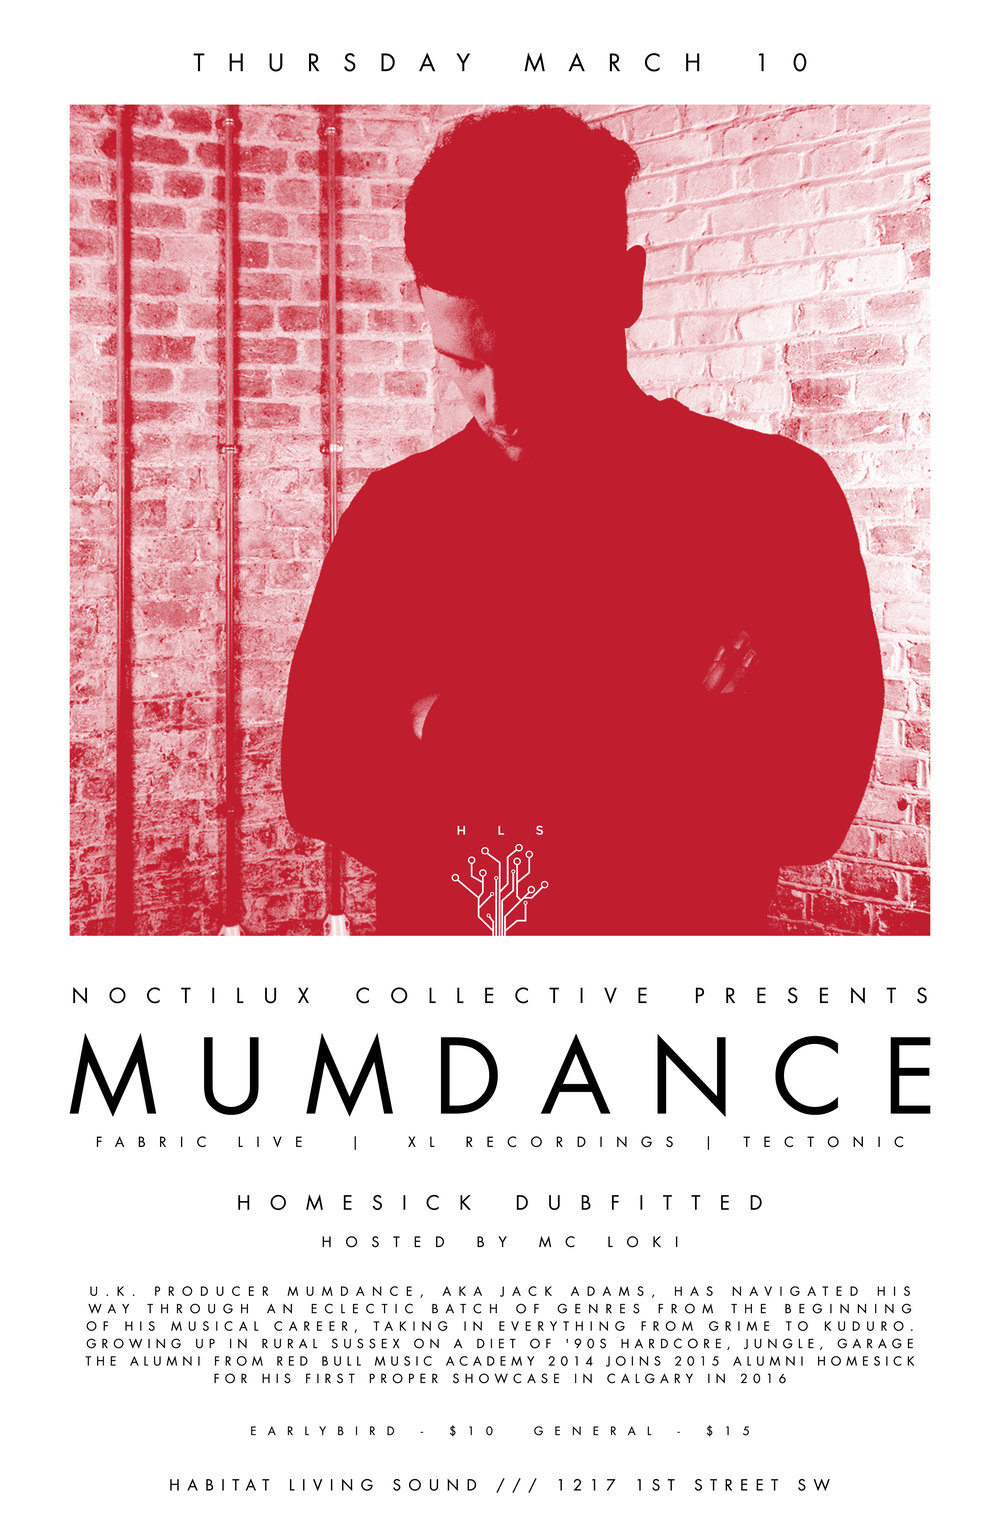 mumdance-habitat-living-sound.jpeg